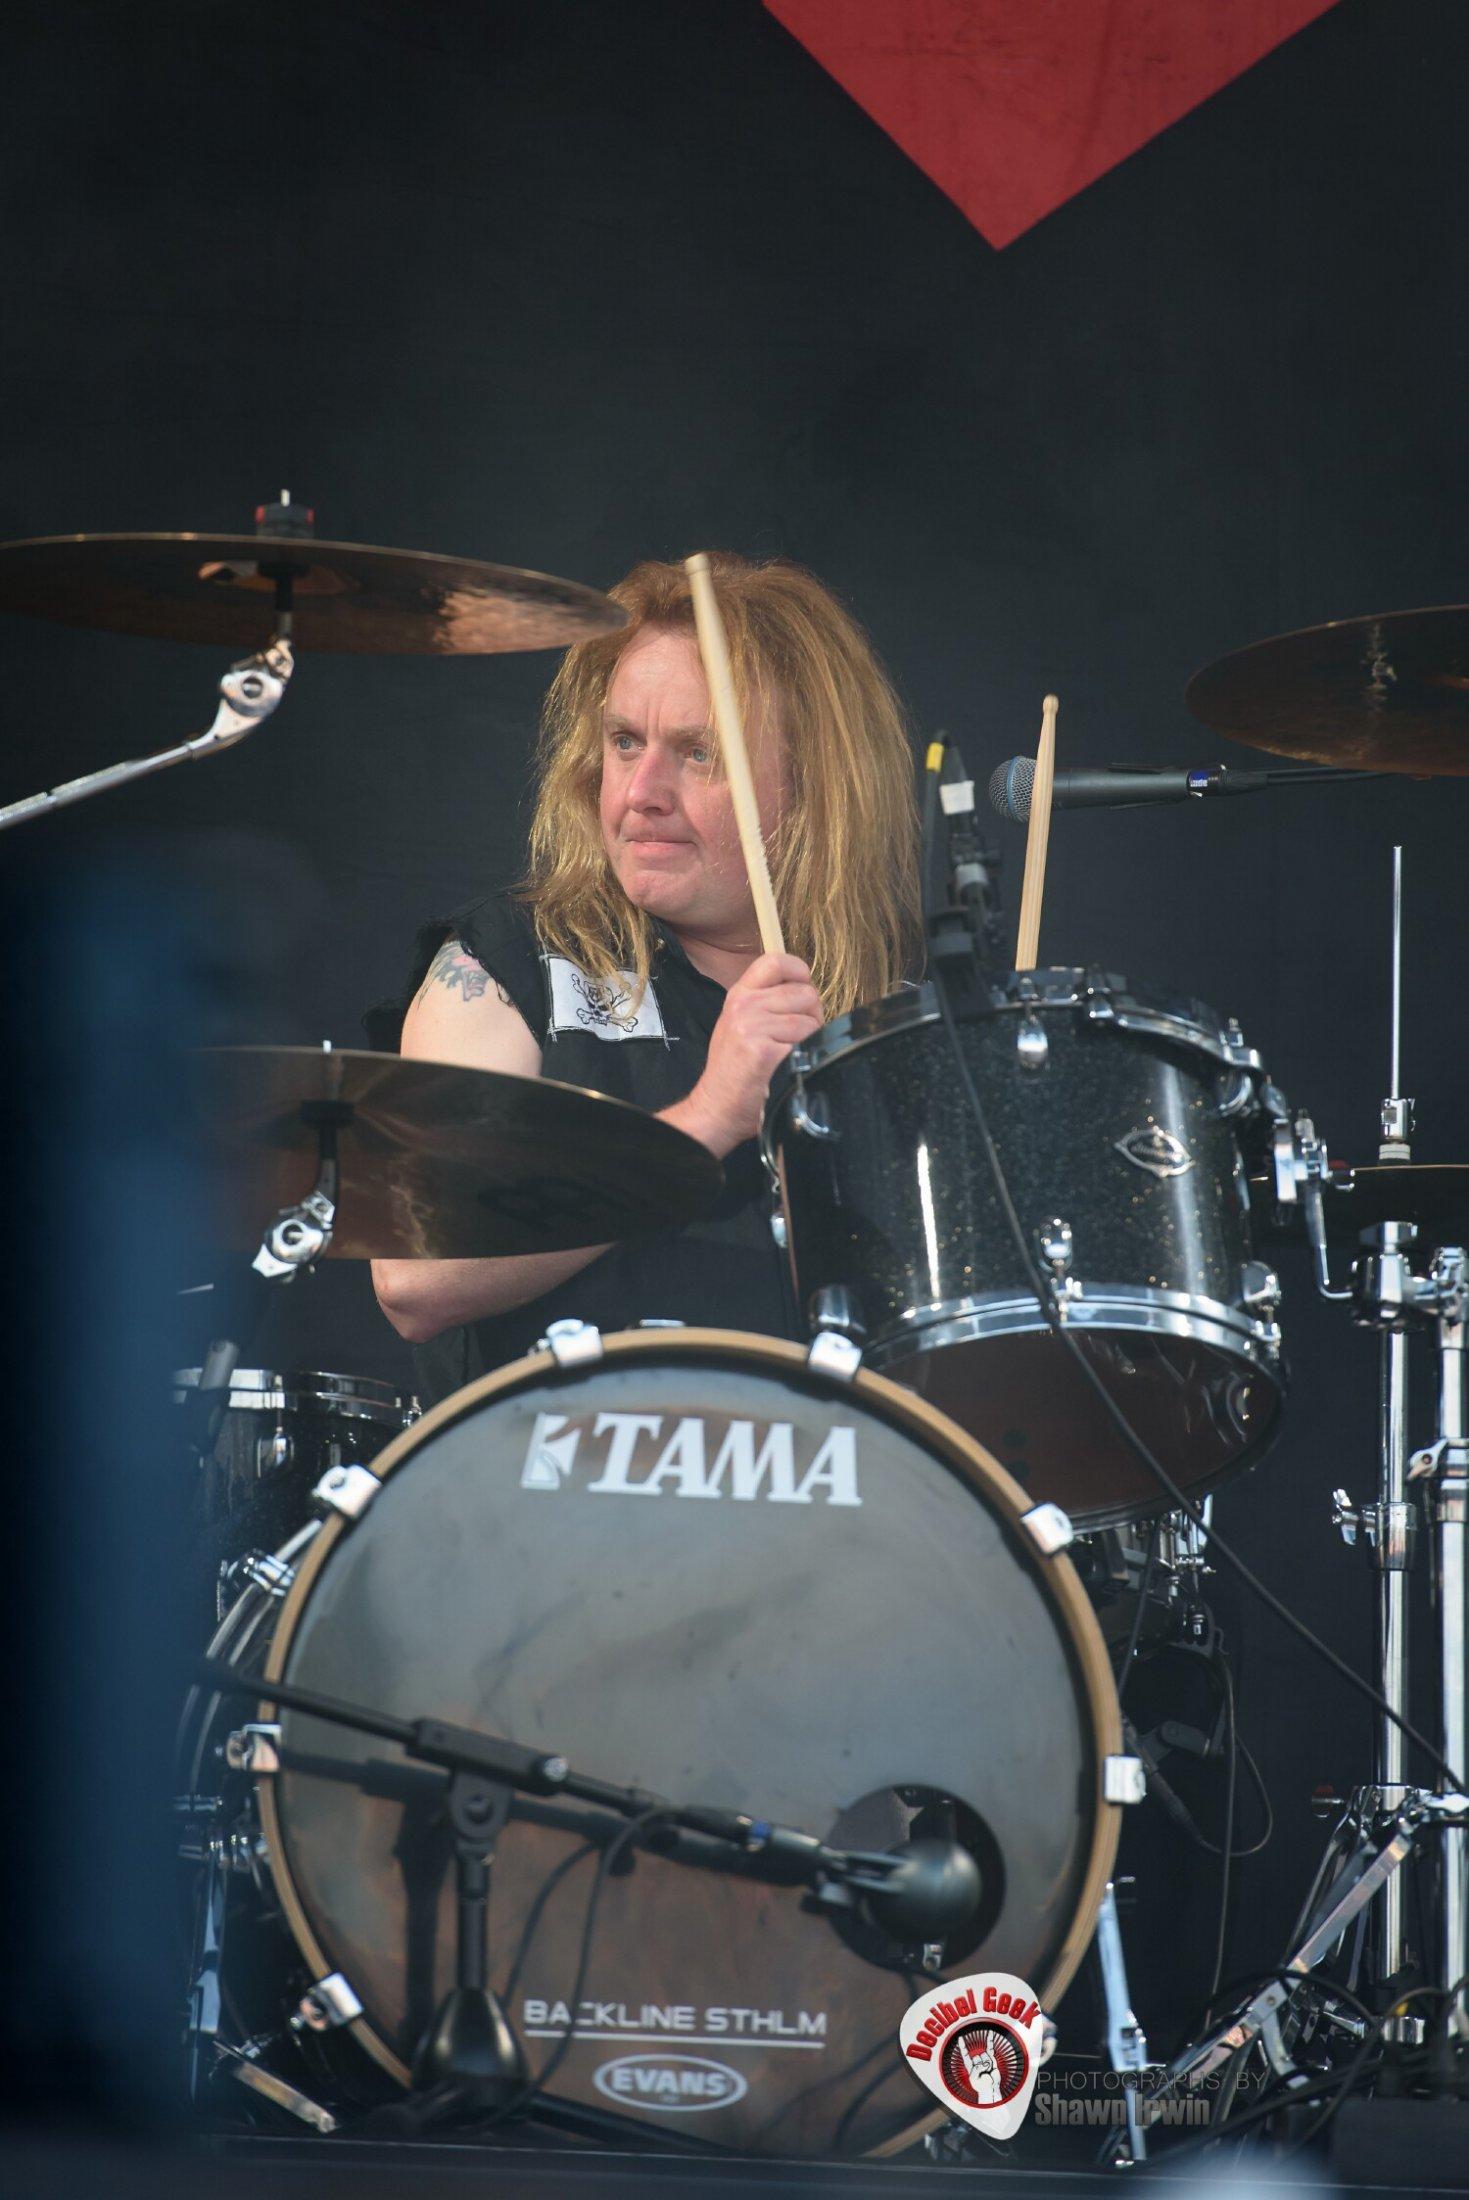 Demon #9-Sweden Rock 2019-Shawn Irwin